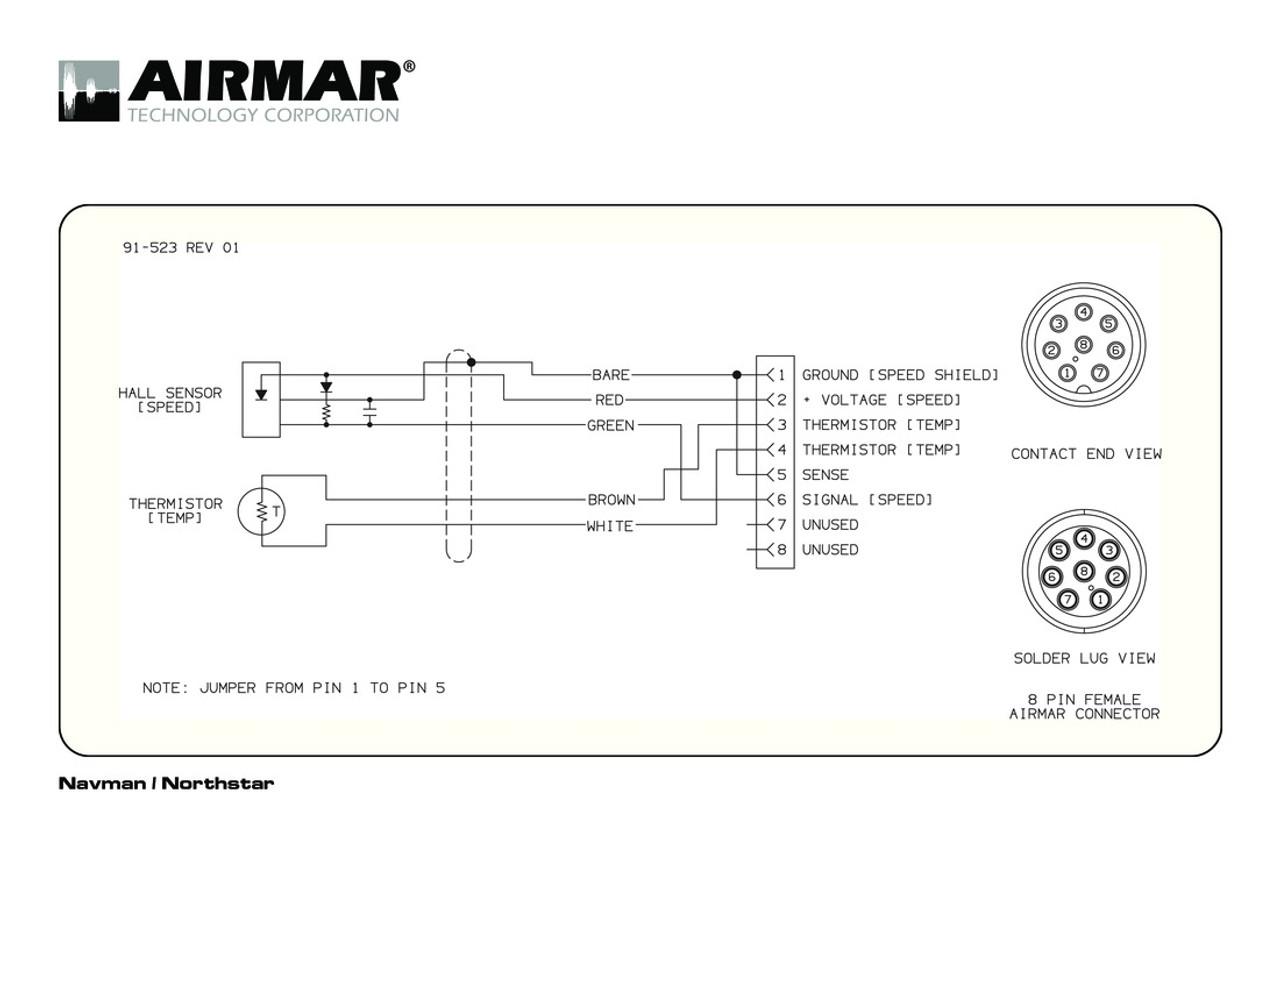 medium resolution of  samsung sigtronics wiring diagram electrical wiring diagram on apple headphone wire diagram samsung galaxy s4